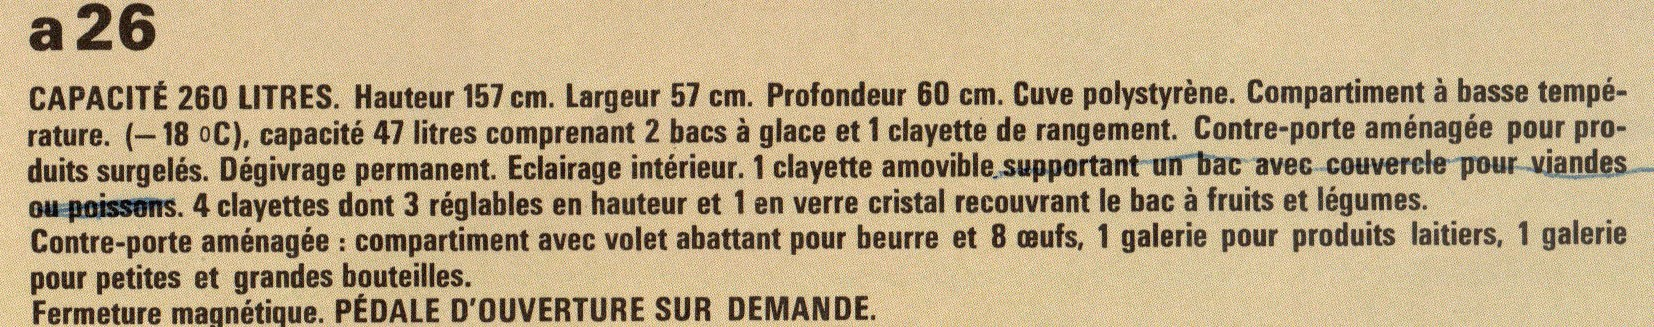 description a 26